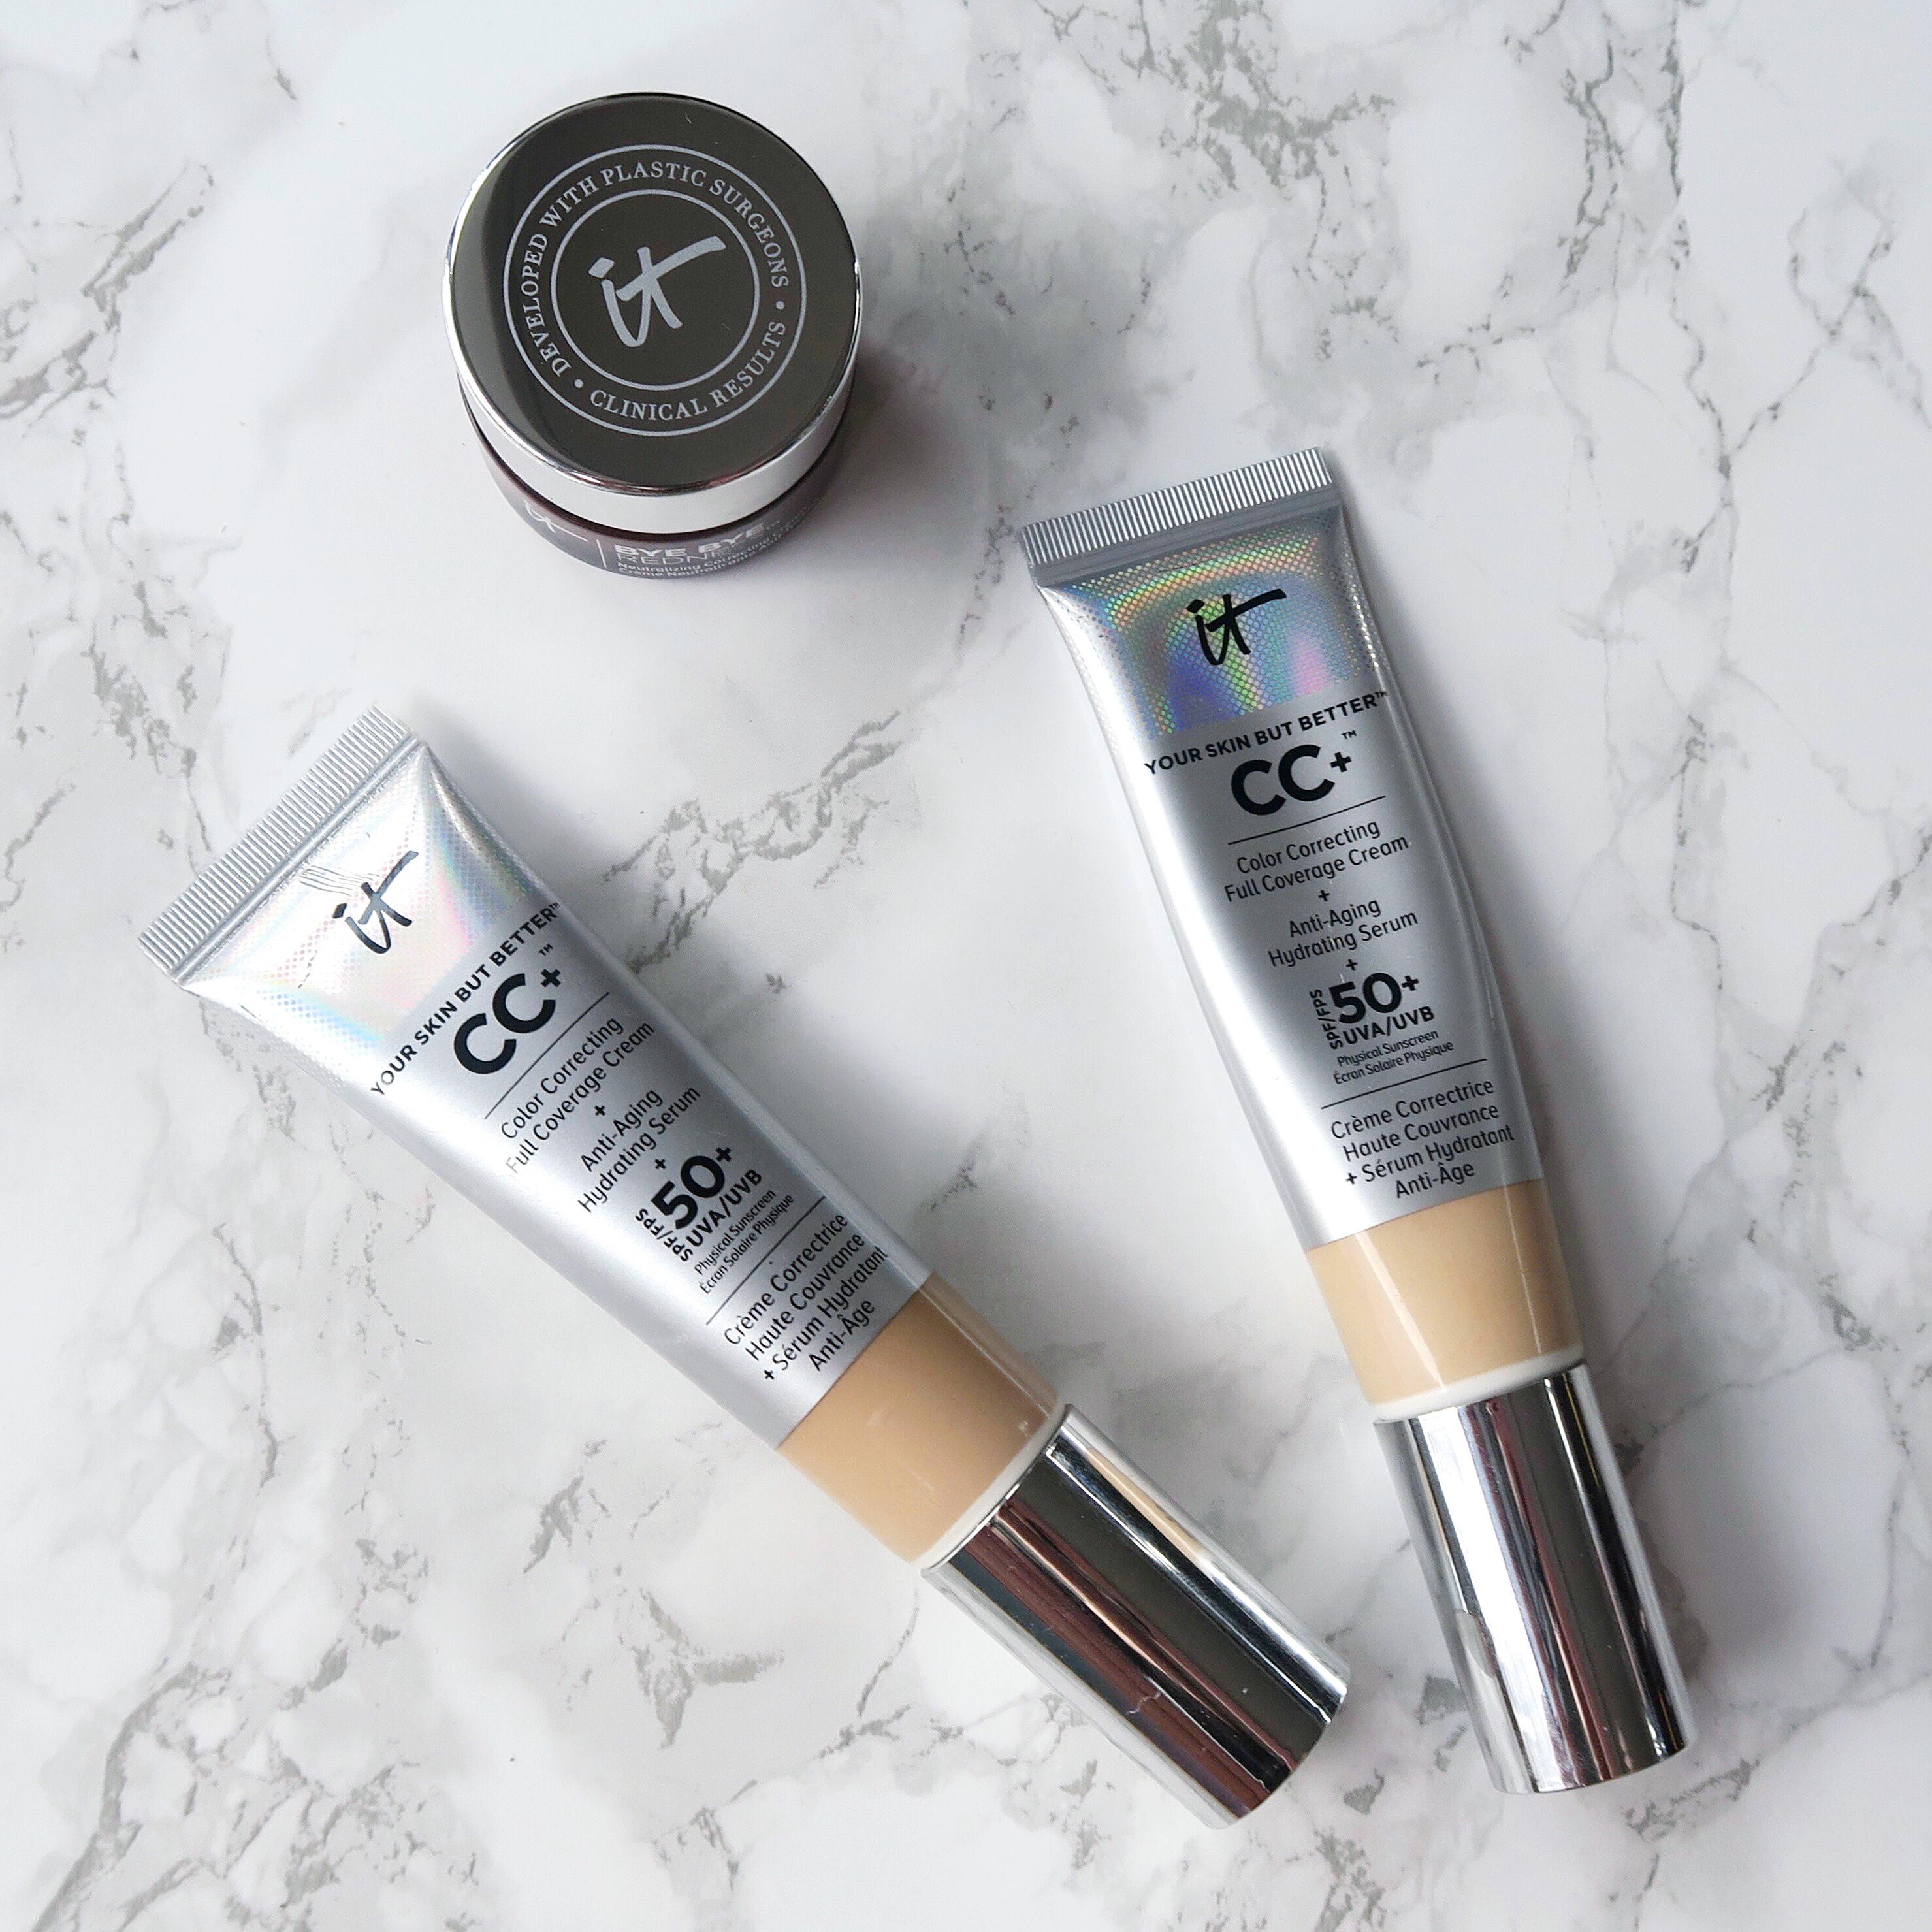 IT Cosmetics foundation comparison: CC+ Cream vs Bye Bye Redness